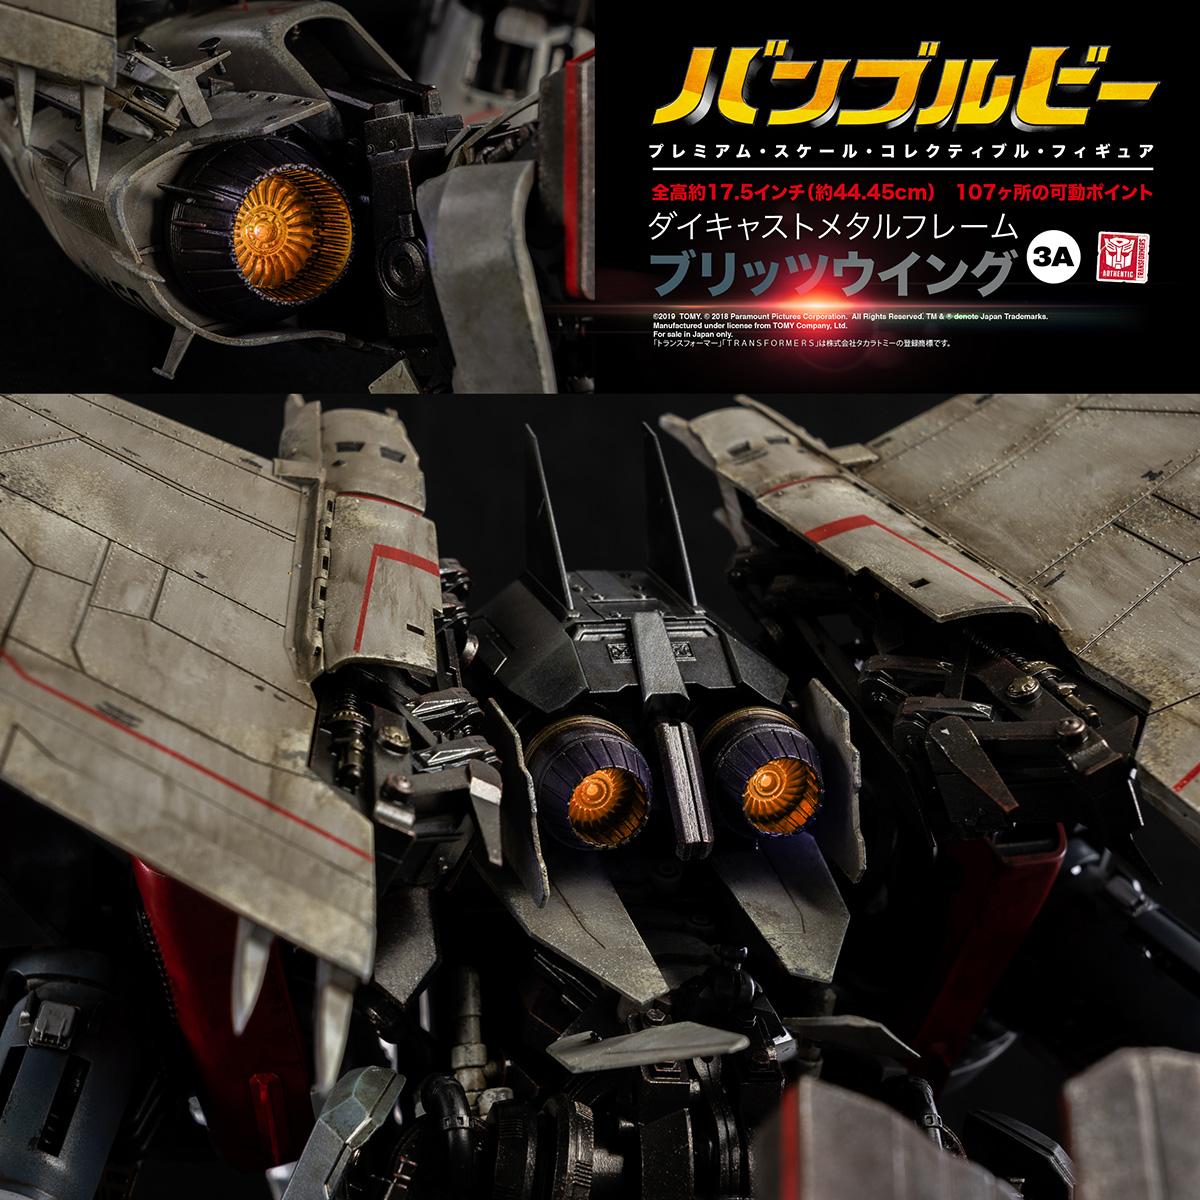 Blitzwing_PM_JAP_1125&30.jpg